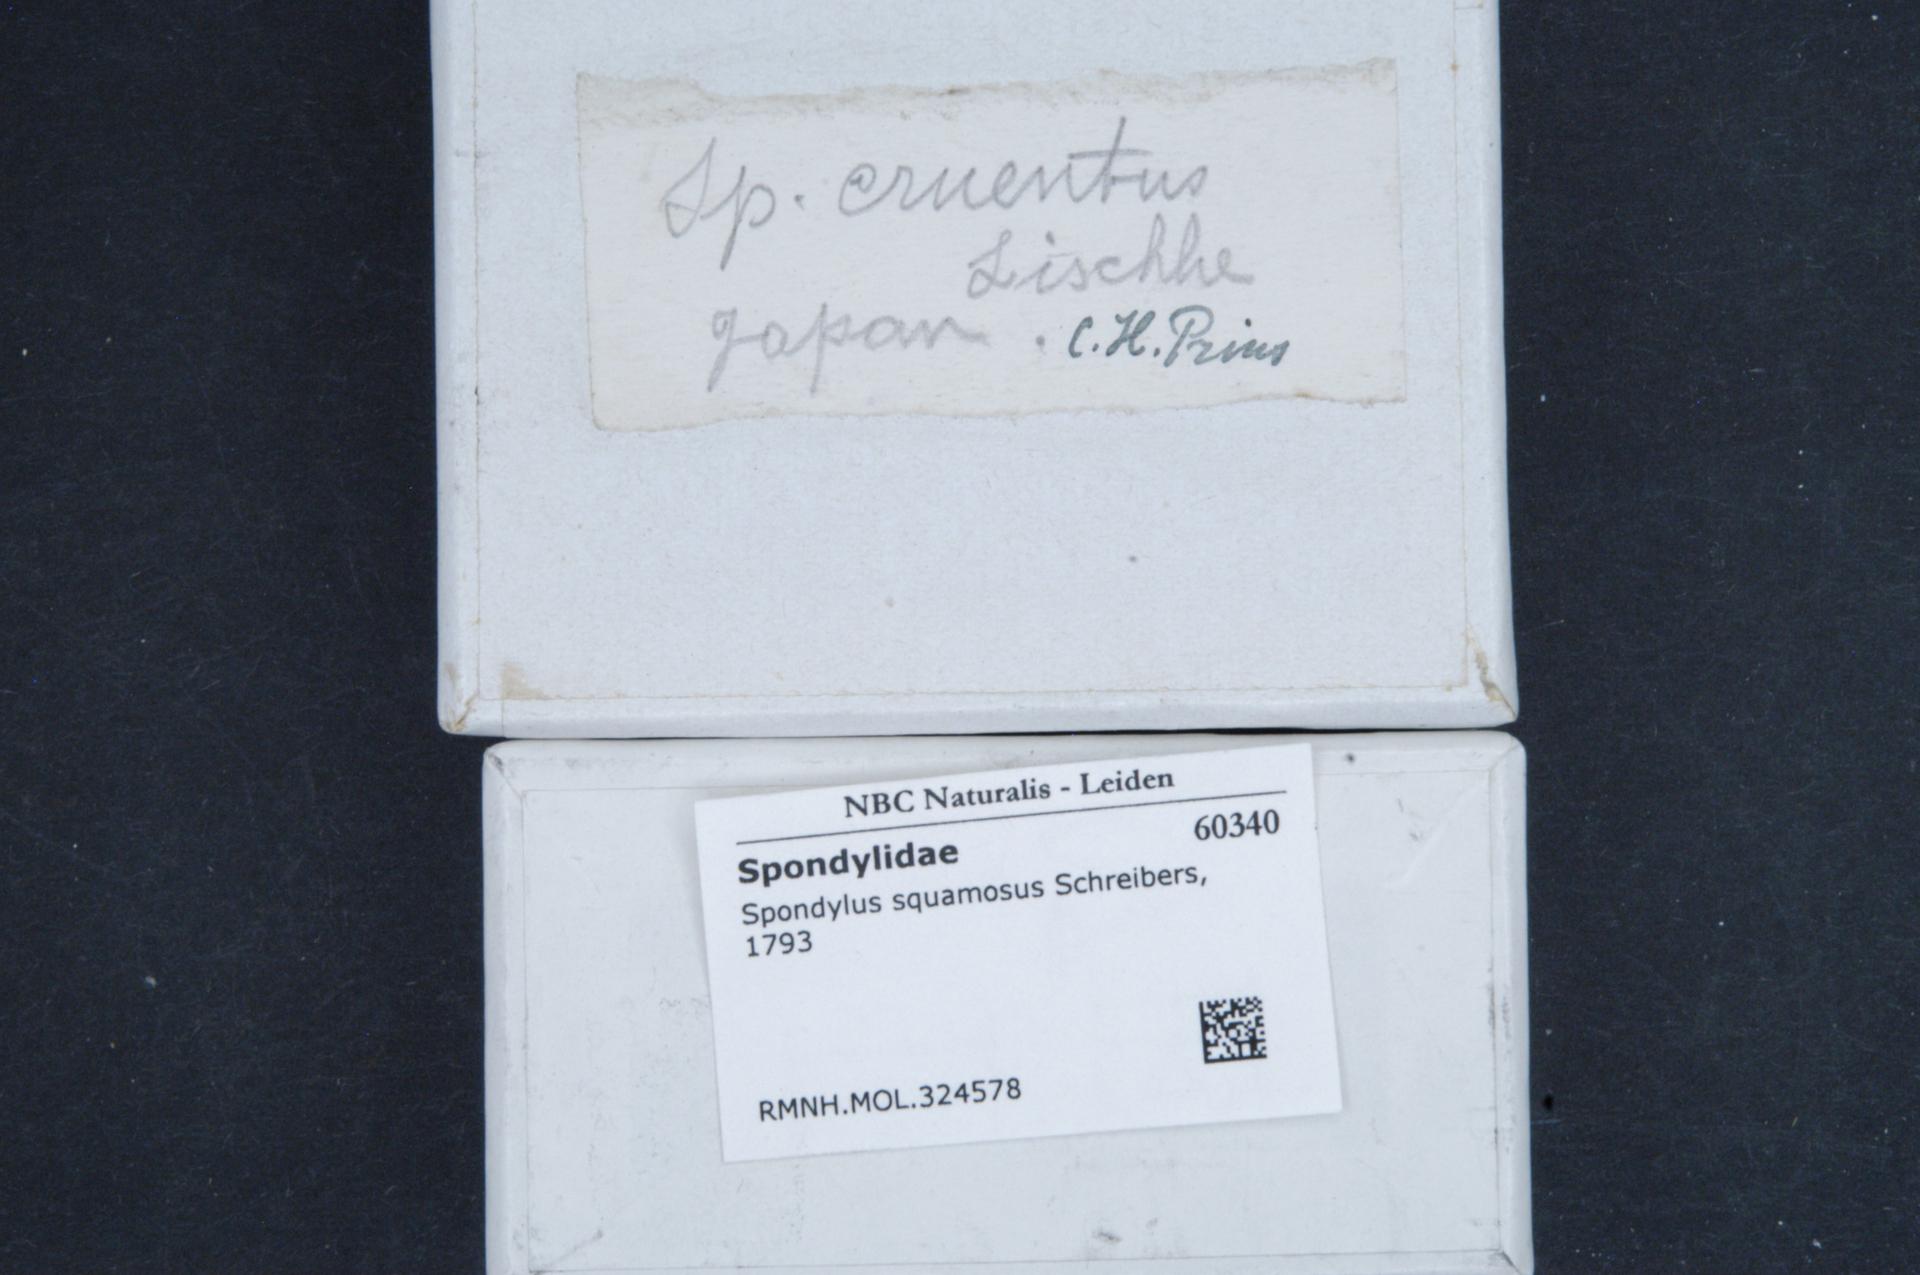 RMNH.MOL.324578 | Spondylus squamosus Schreibers, 1793